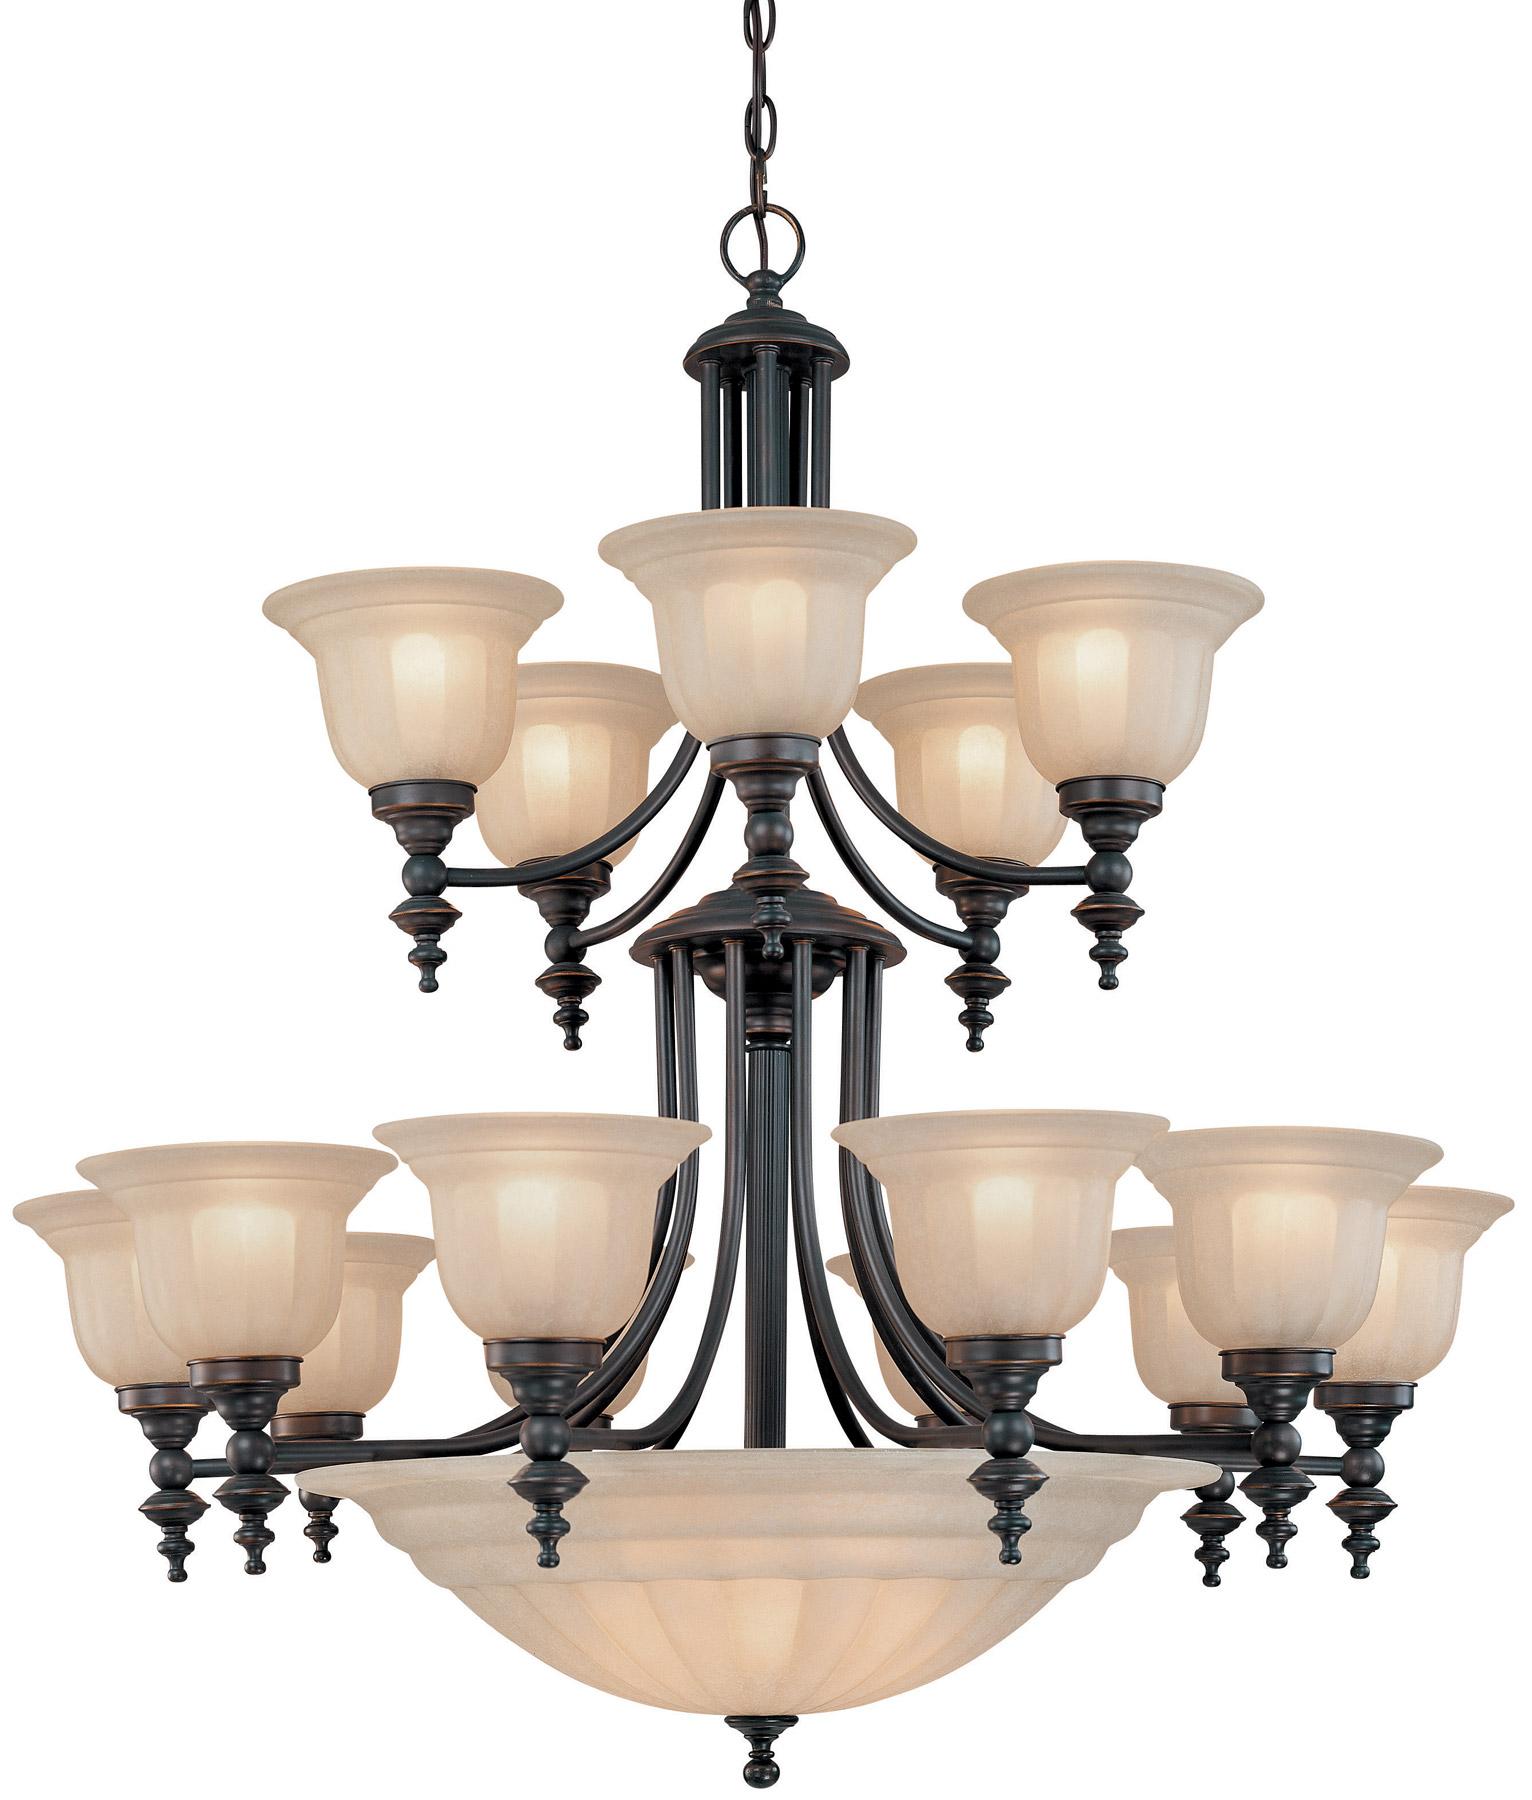 sc 1 st  L&s Beautiful & Dolan Designs 668-78 Richland Twenty Light Chandelier